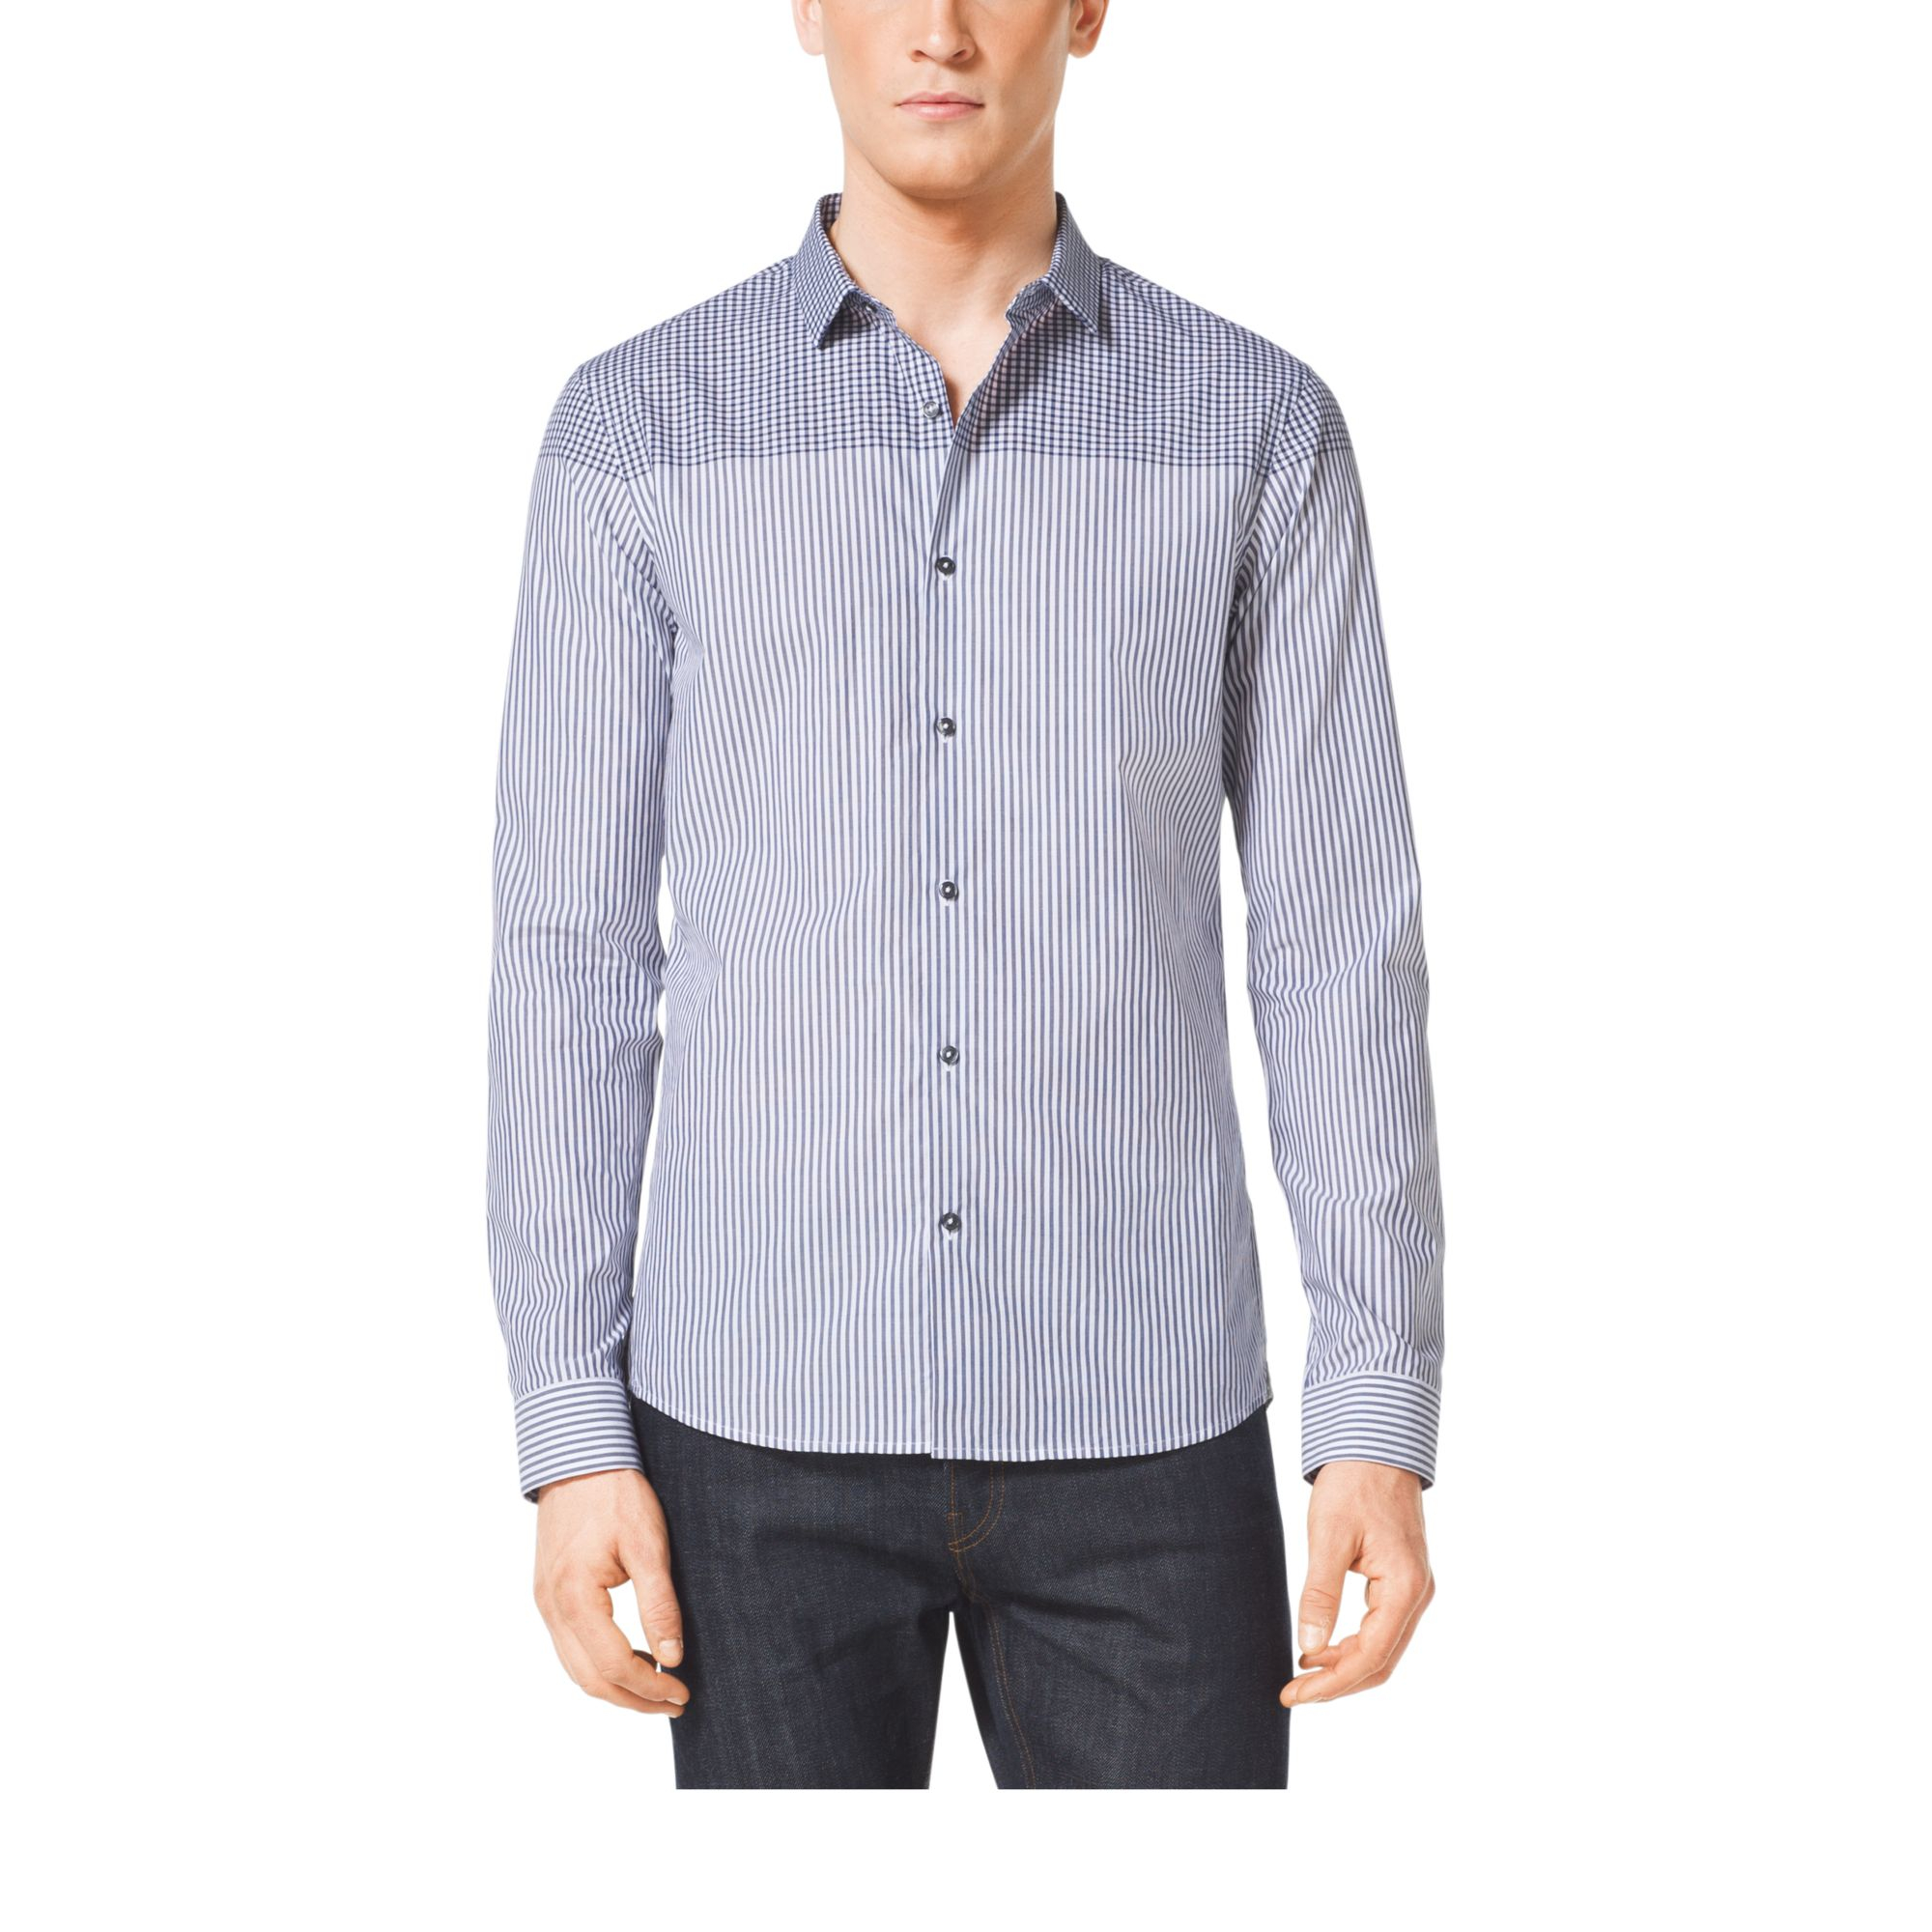 Michael Kors Slim Fit Check Cotton Shirt In Blue For Men